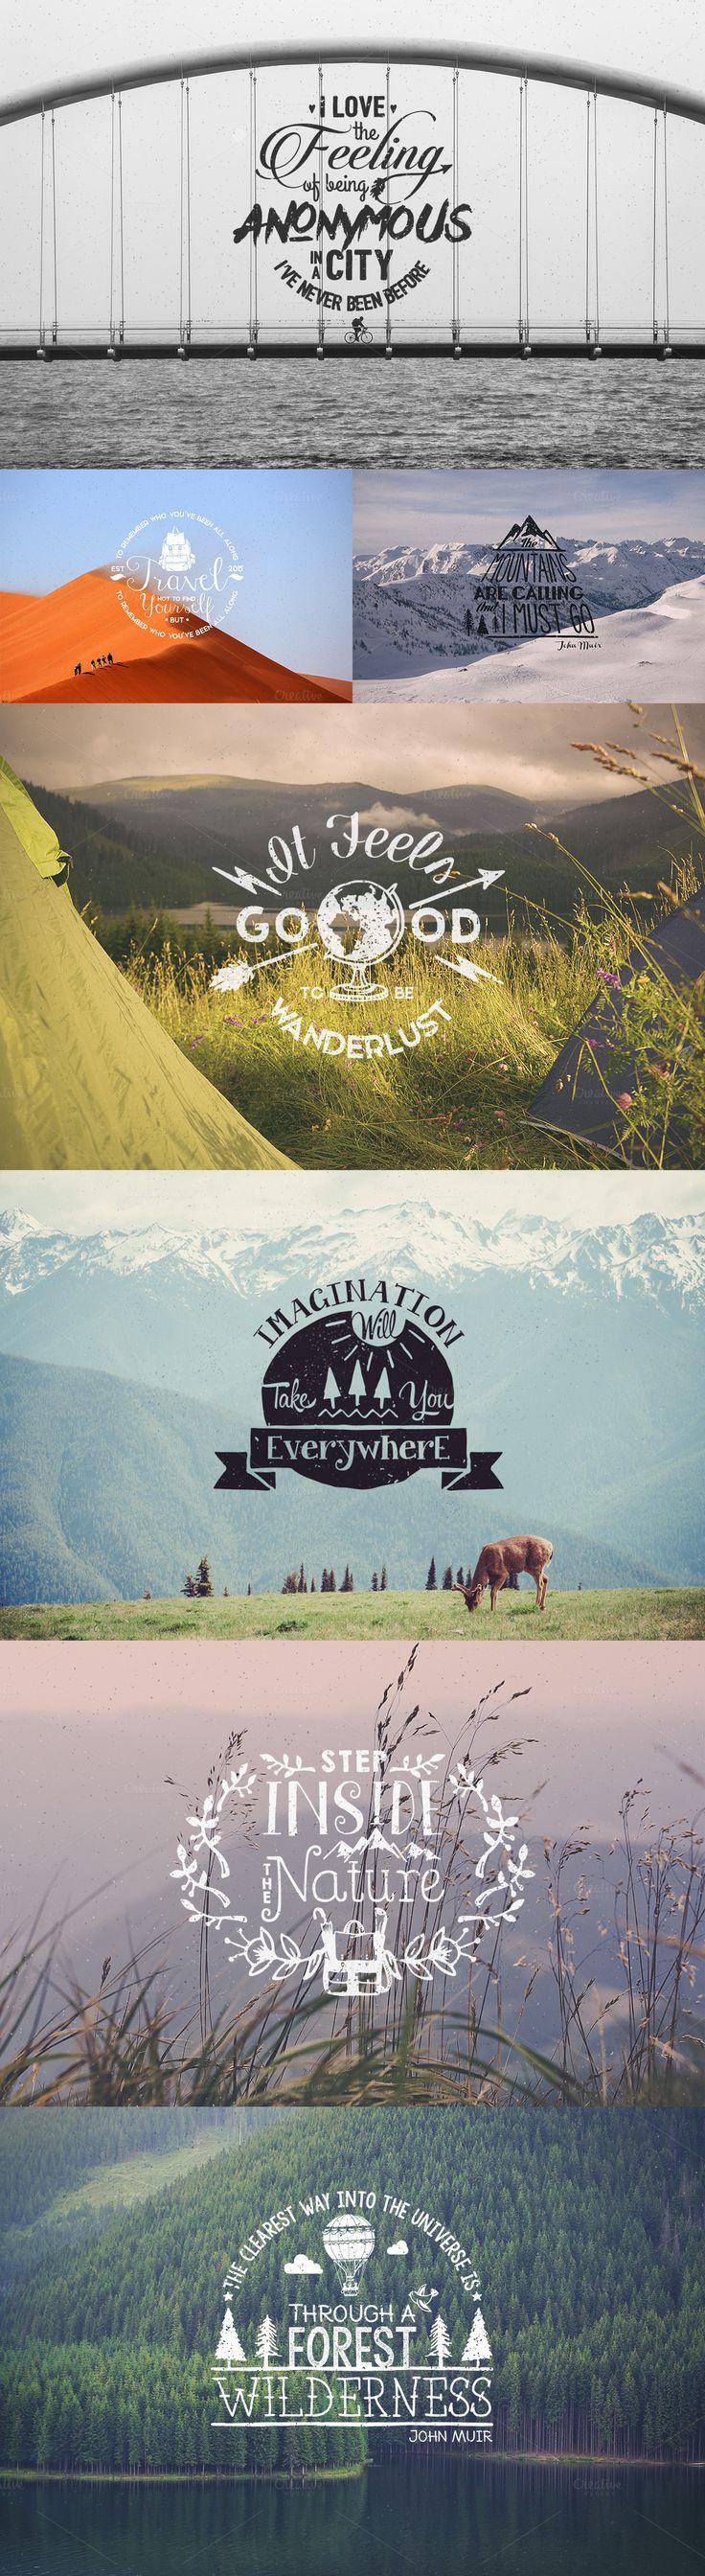 Wanderlust Logo Pack by Stella's Graphic Supply on Creative Market